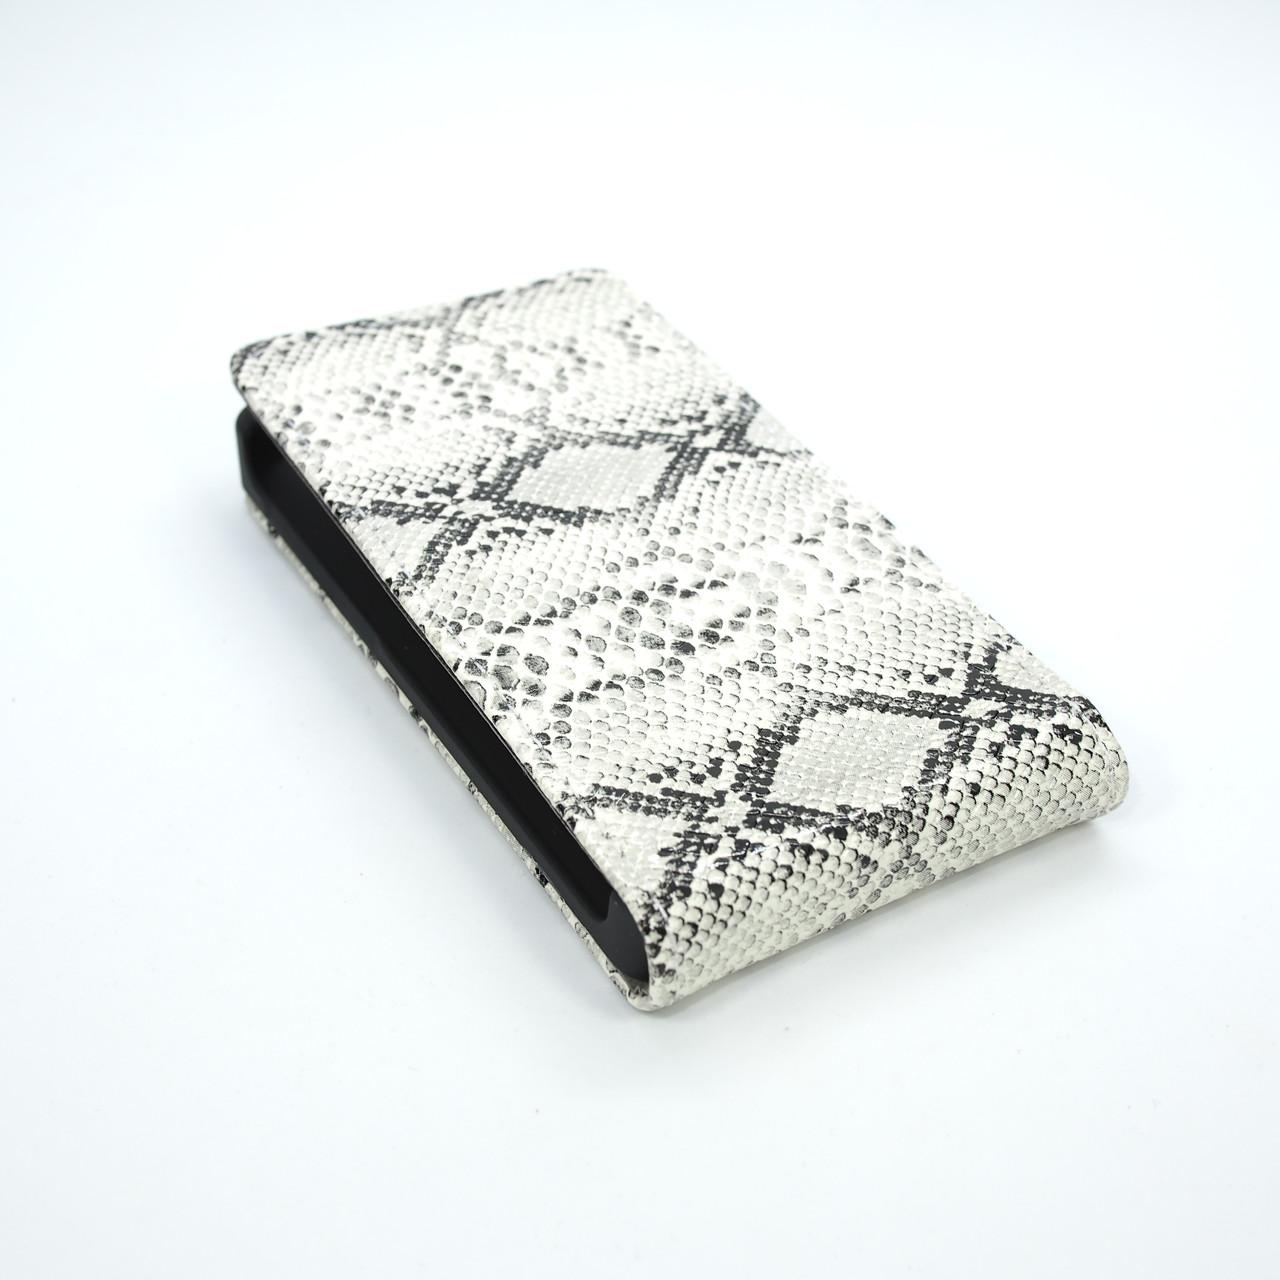 Чехлы для LG Croco L5 2 Для телефона